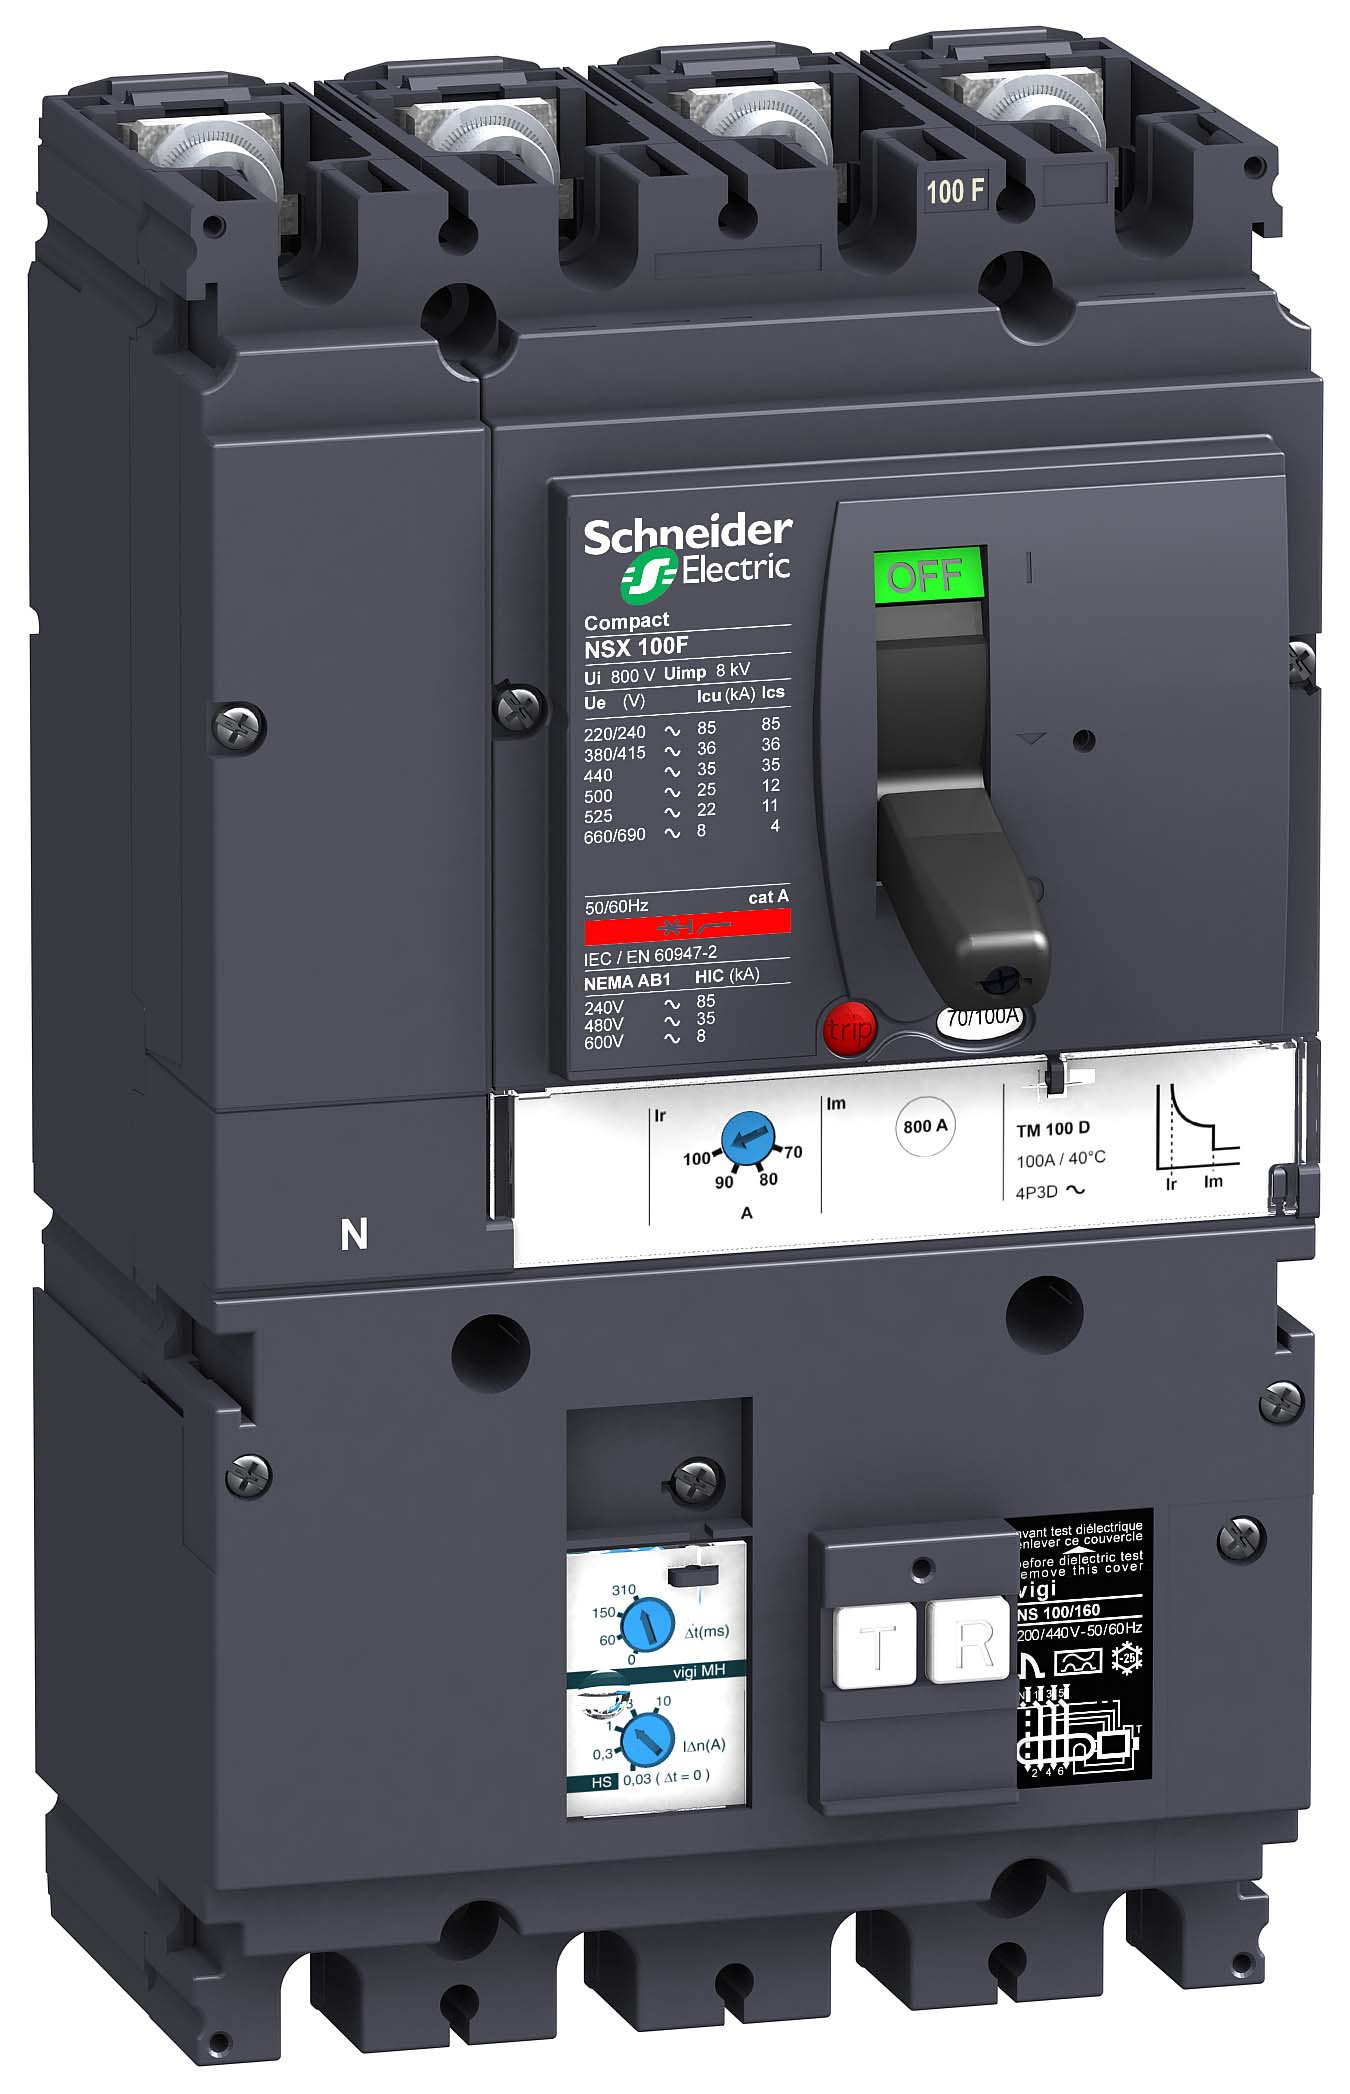 Image Description for https://tedi.itc-electronics.com/itcmedia/images/20190424/LV429941_SCHNEIDERELECTRIC_2.jpg